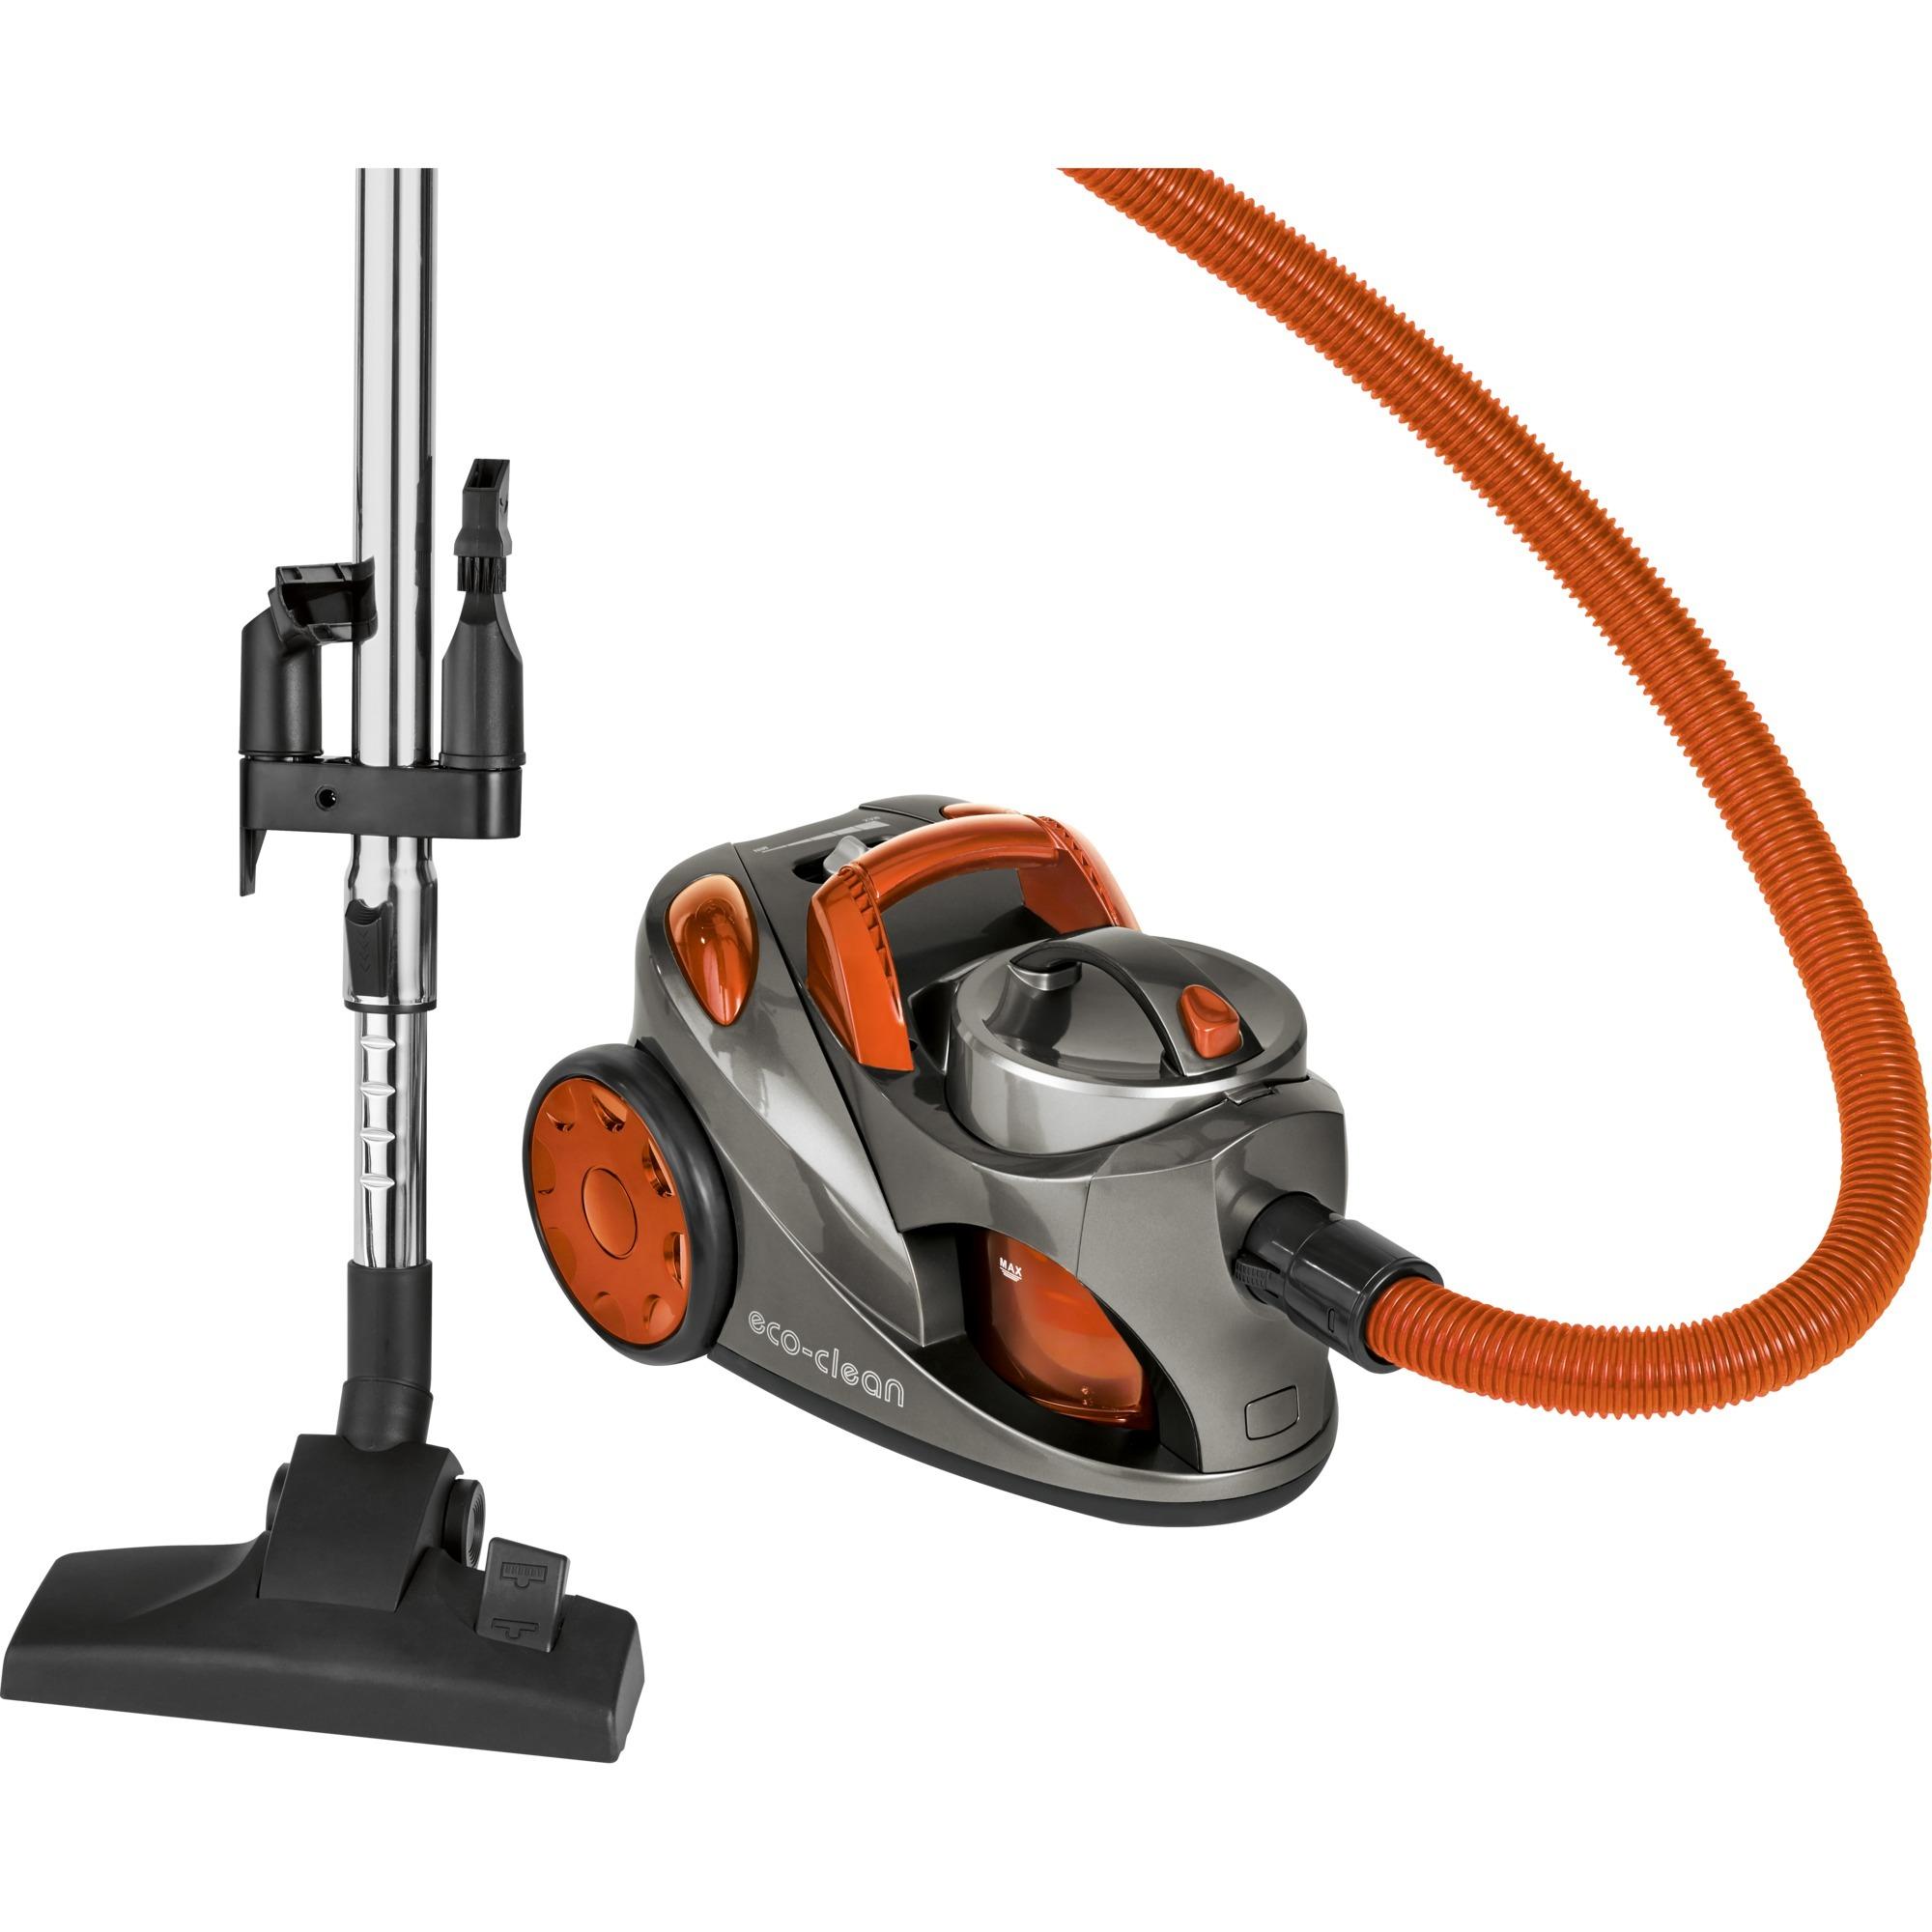 BS 9018 CB 700 W A Aspiradora cilíndrica 1,25 L Gris, Naranja, Aspiradora de suelo